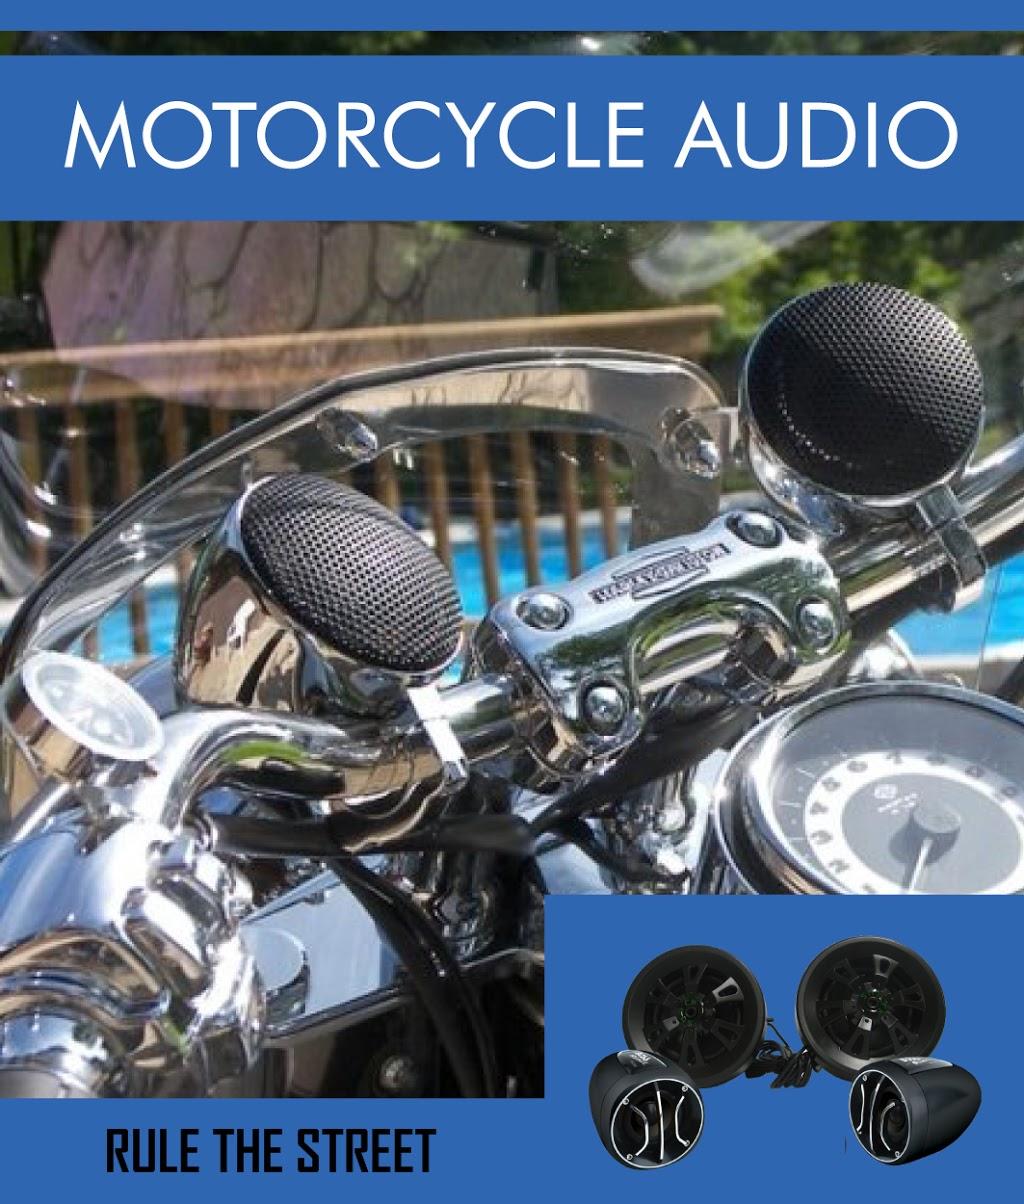 Livewire Customs - car repair  | Photo 8 of 10 | Address: 1309 W Texas St, Fairfield, CA 94533, USA | Phone: (707) 389-4969